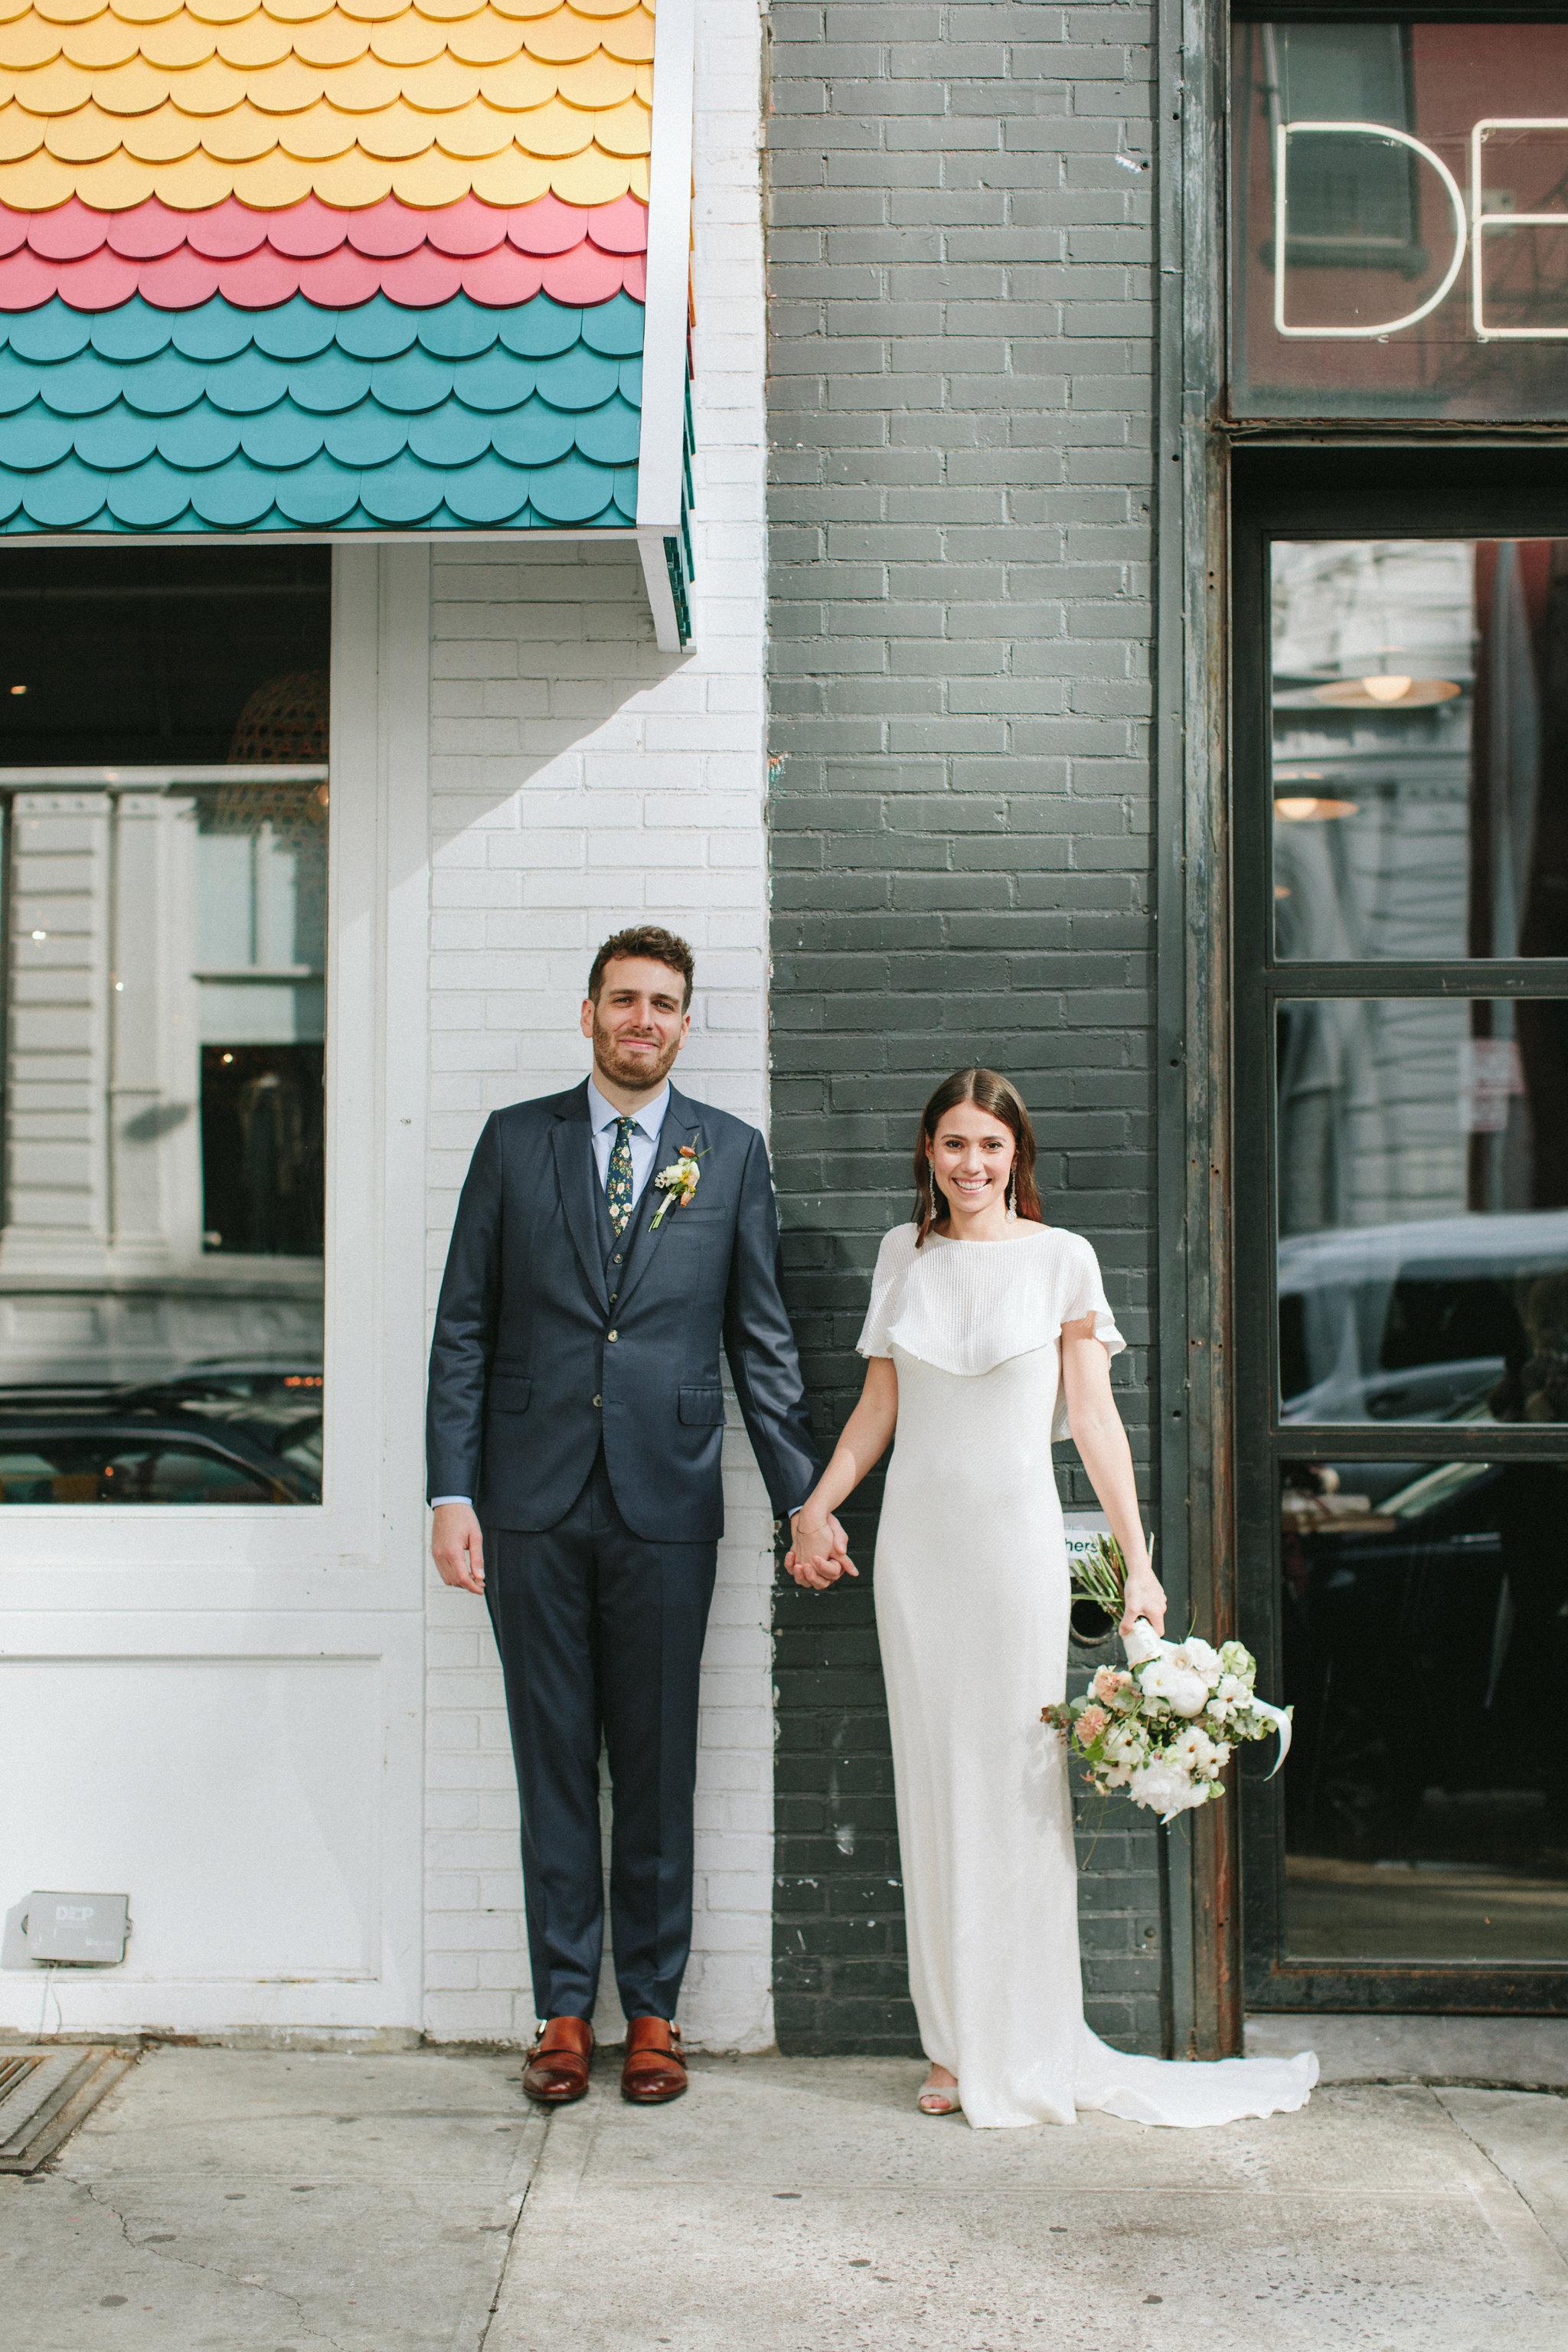 bowery-hotel-wedding-jove-meyer-events-027.jpg